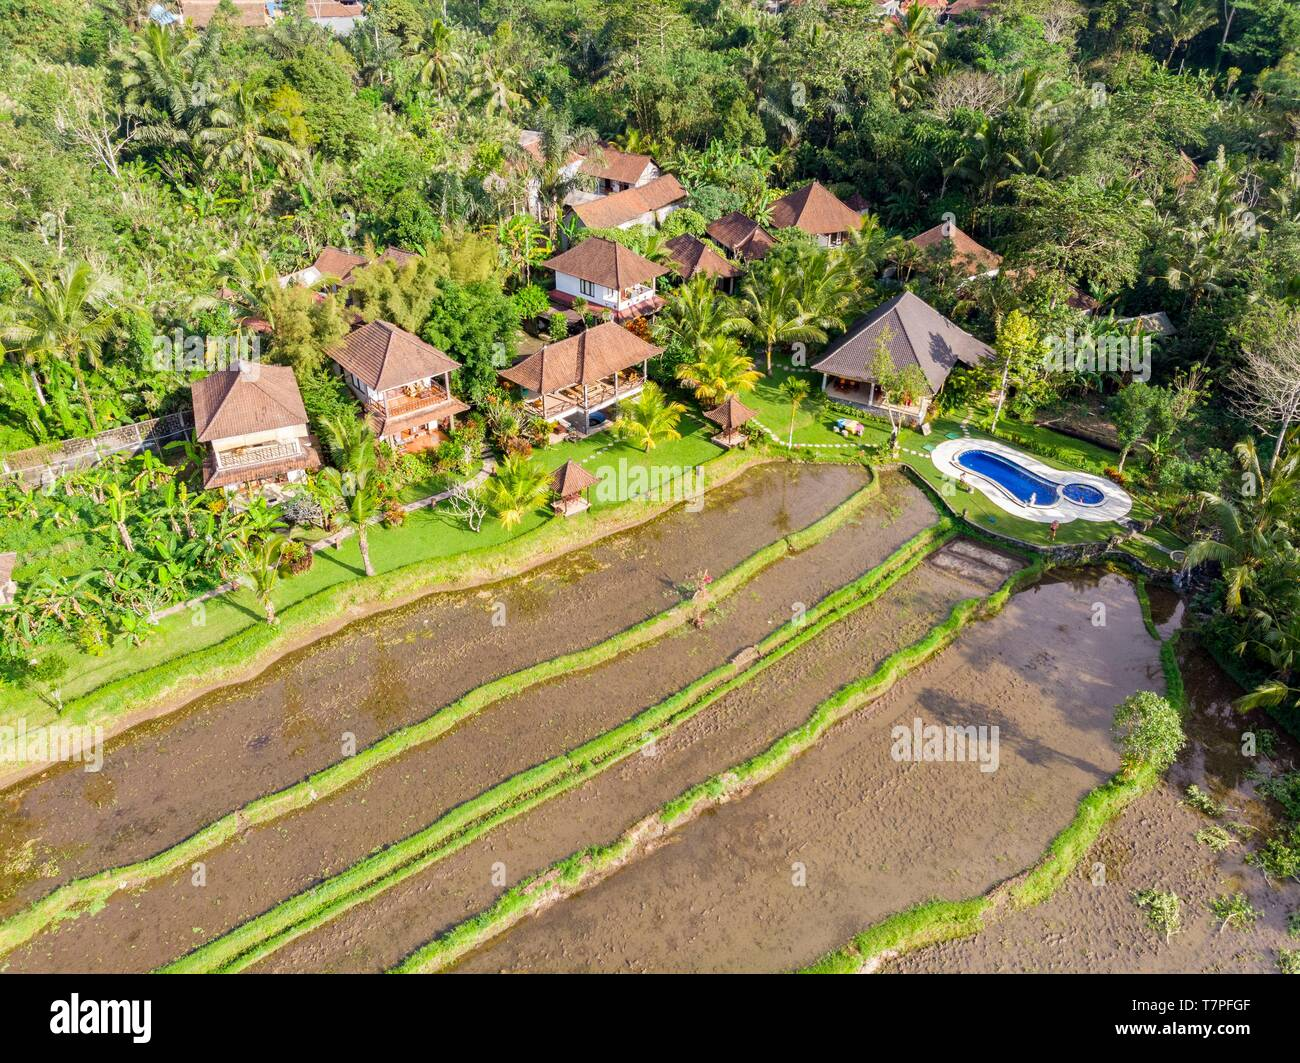 Indonesia East Bali Sidemen Rice Fields Great Mountain Views Villa Resort Aerial View Stock Photo Alamy